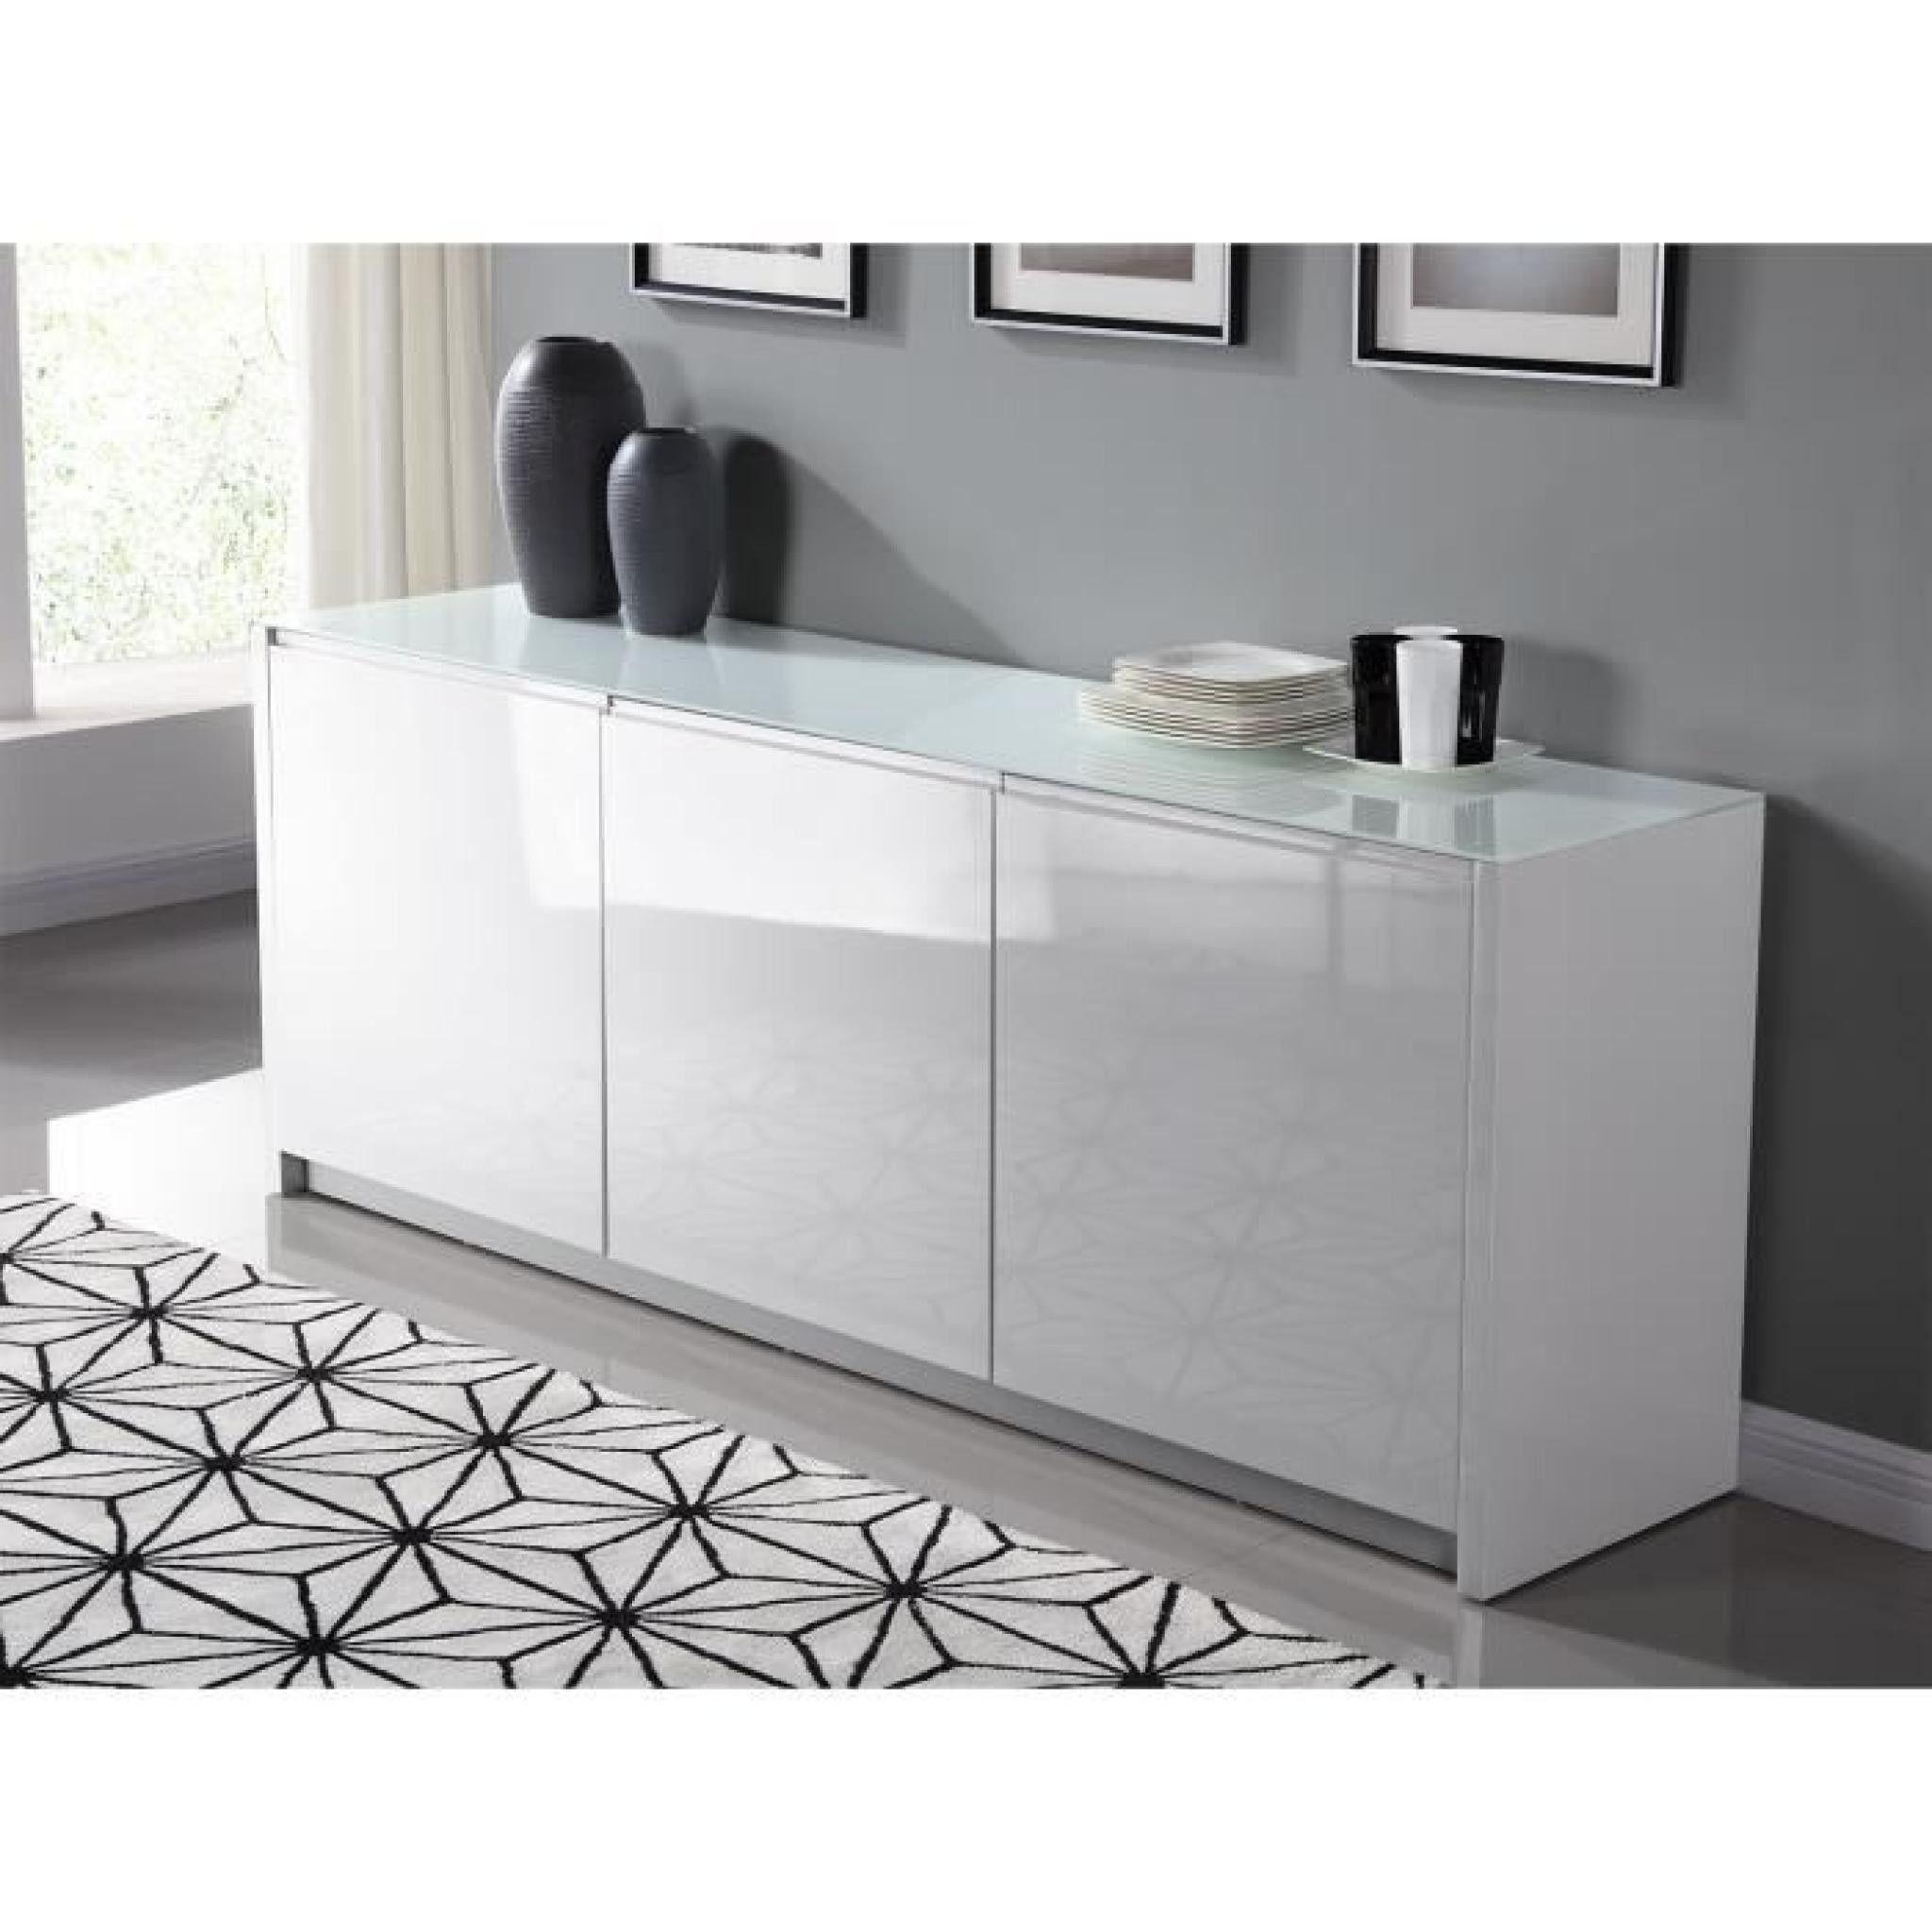 Porte Laque Blanc Ikea buffet laque blanc ikea maison design wiblia concept de